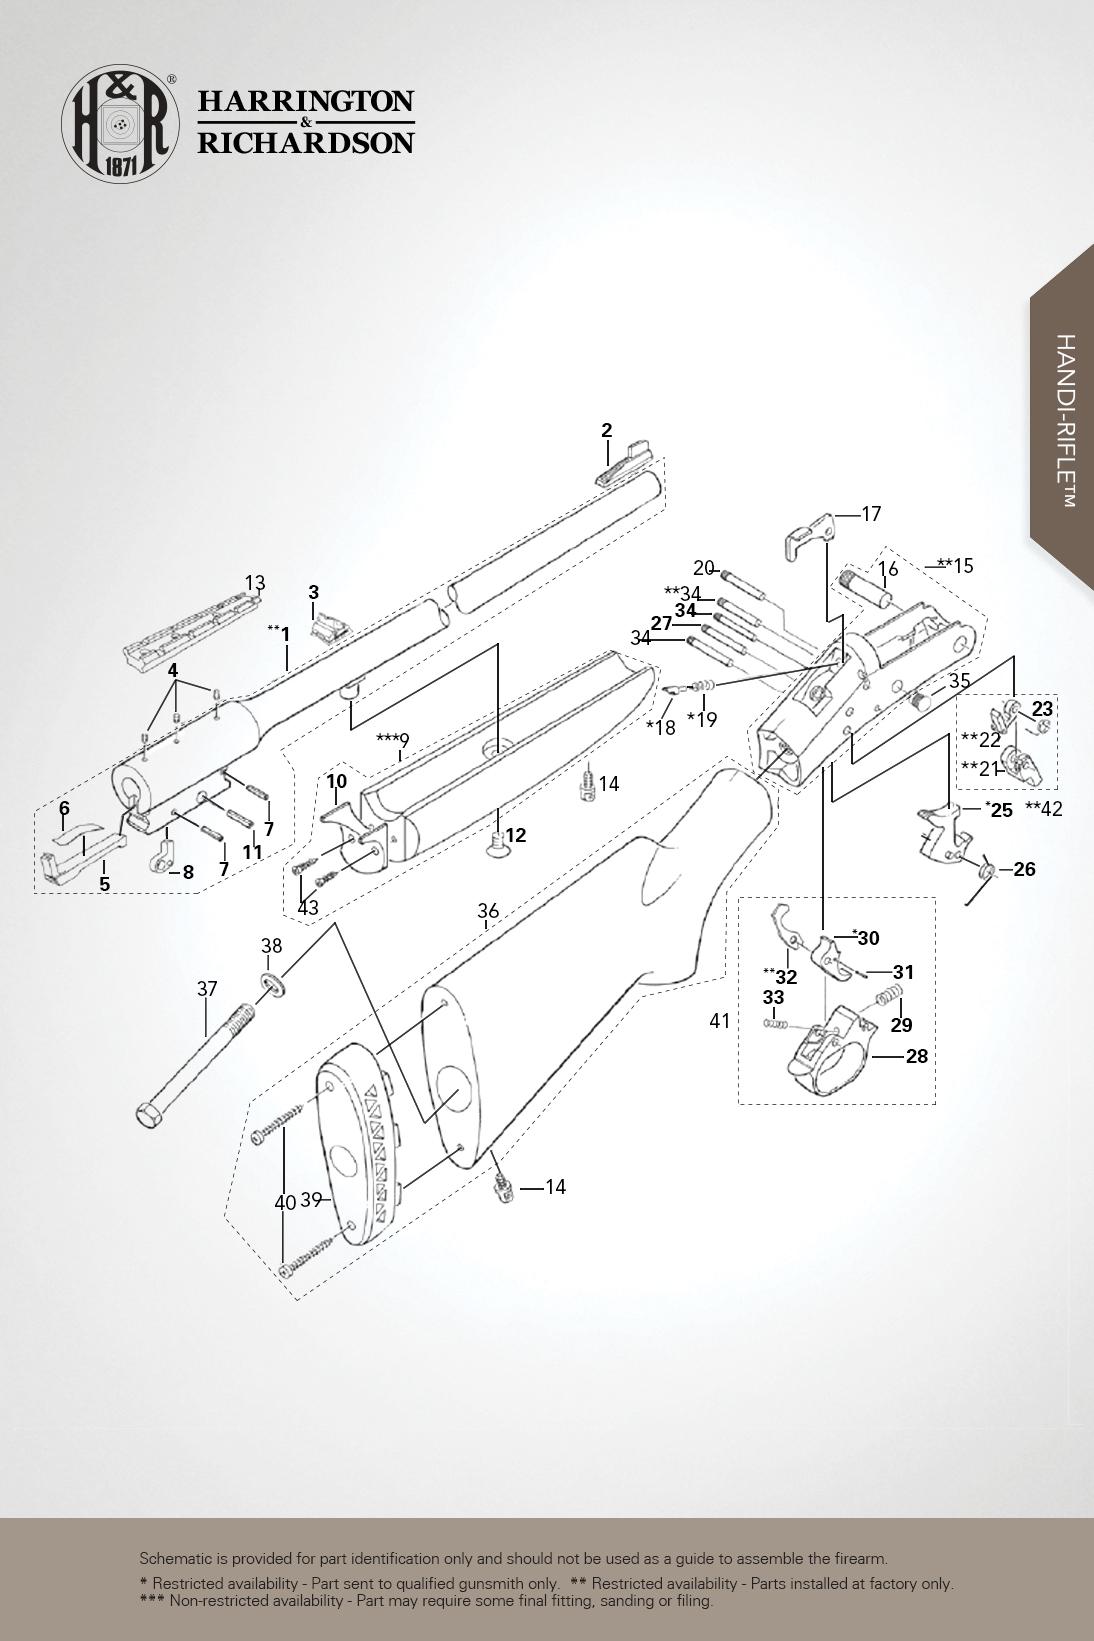 Handi-Rifle™ - Centerfire Rifles - H&R 1871® - OEM Parts